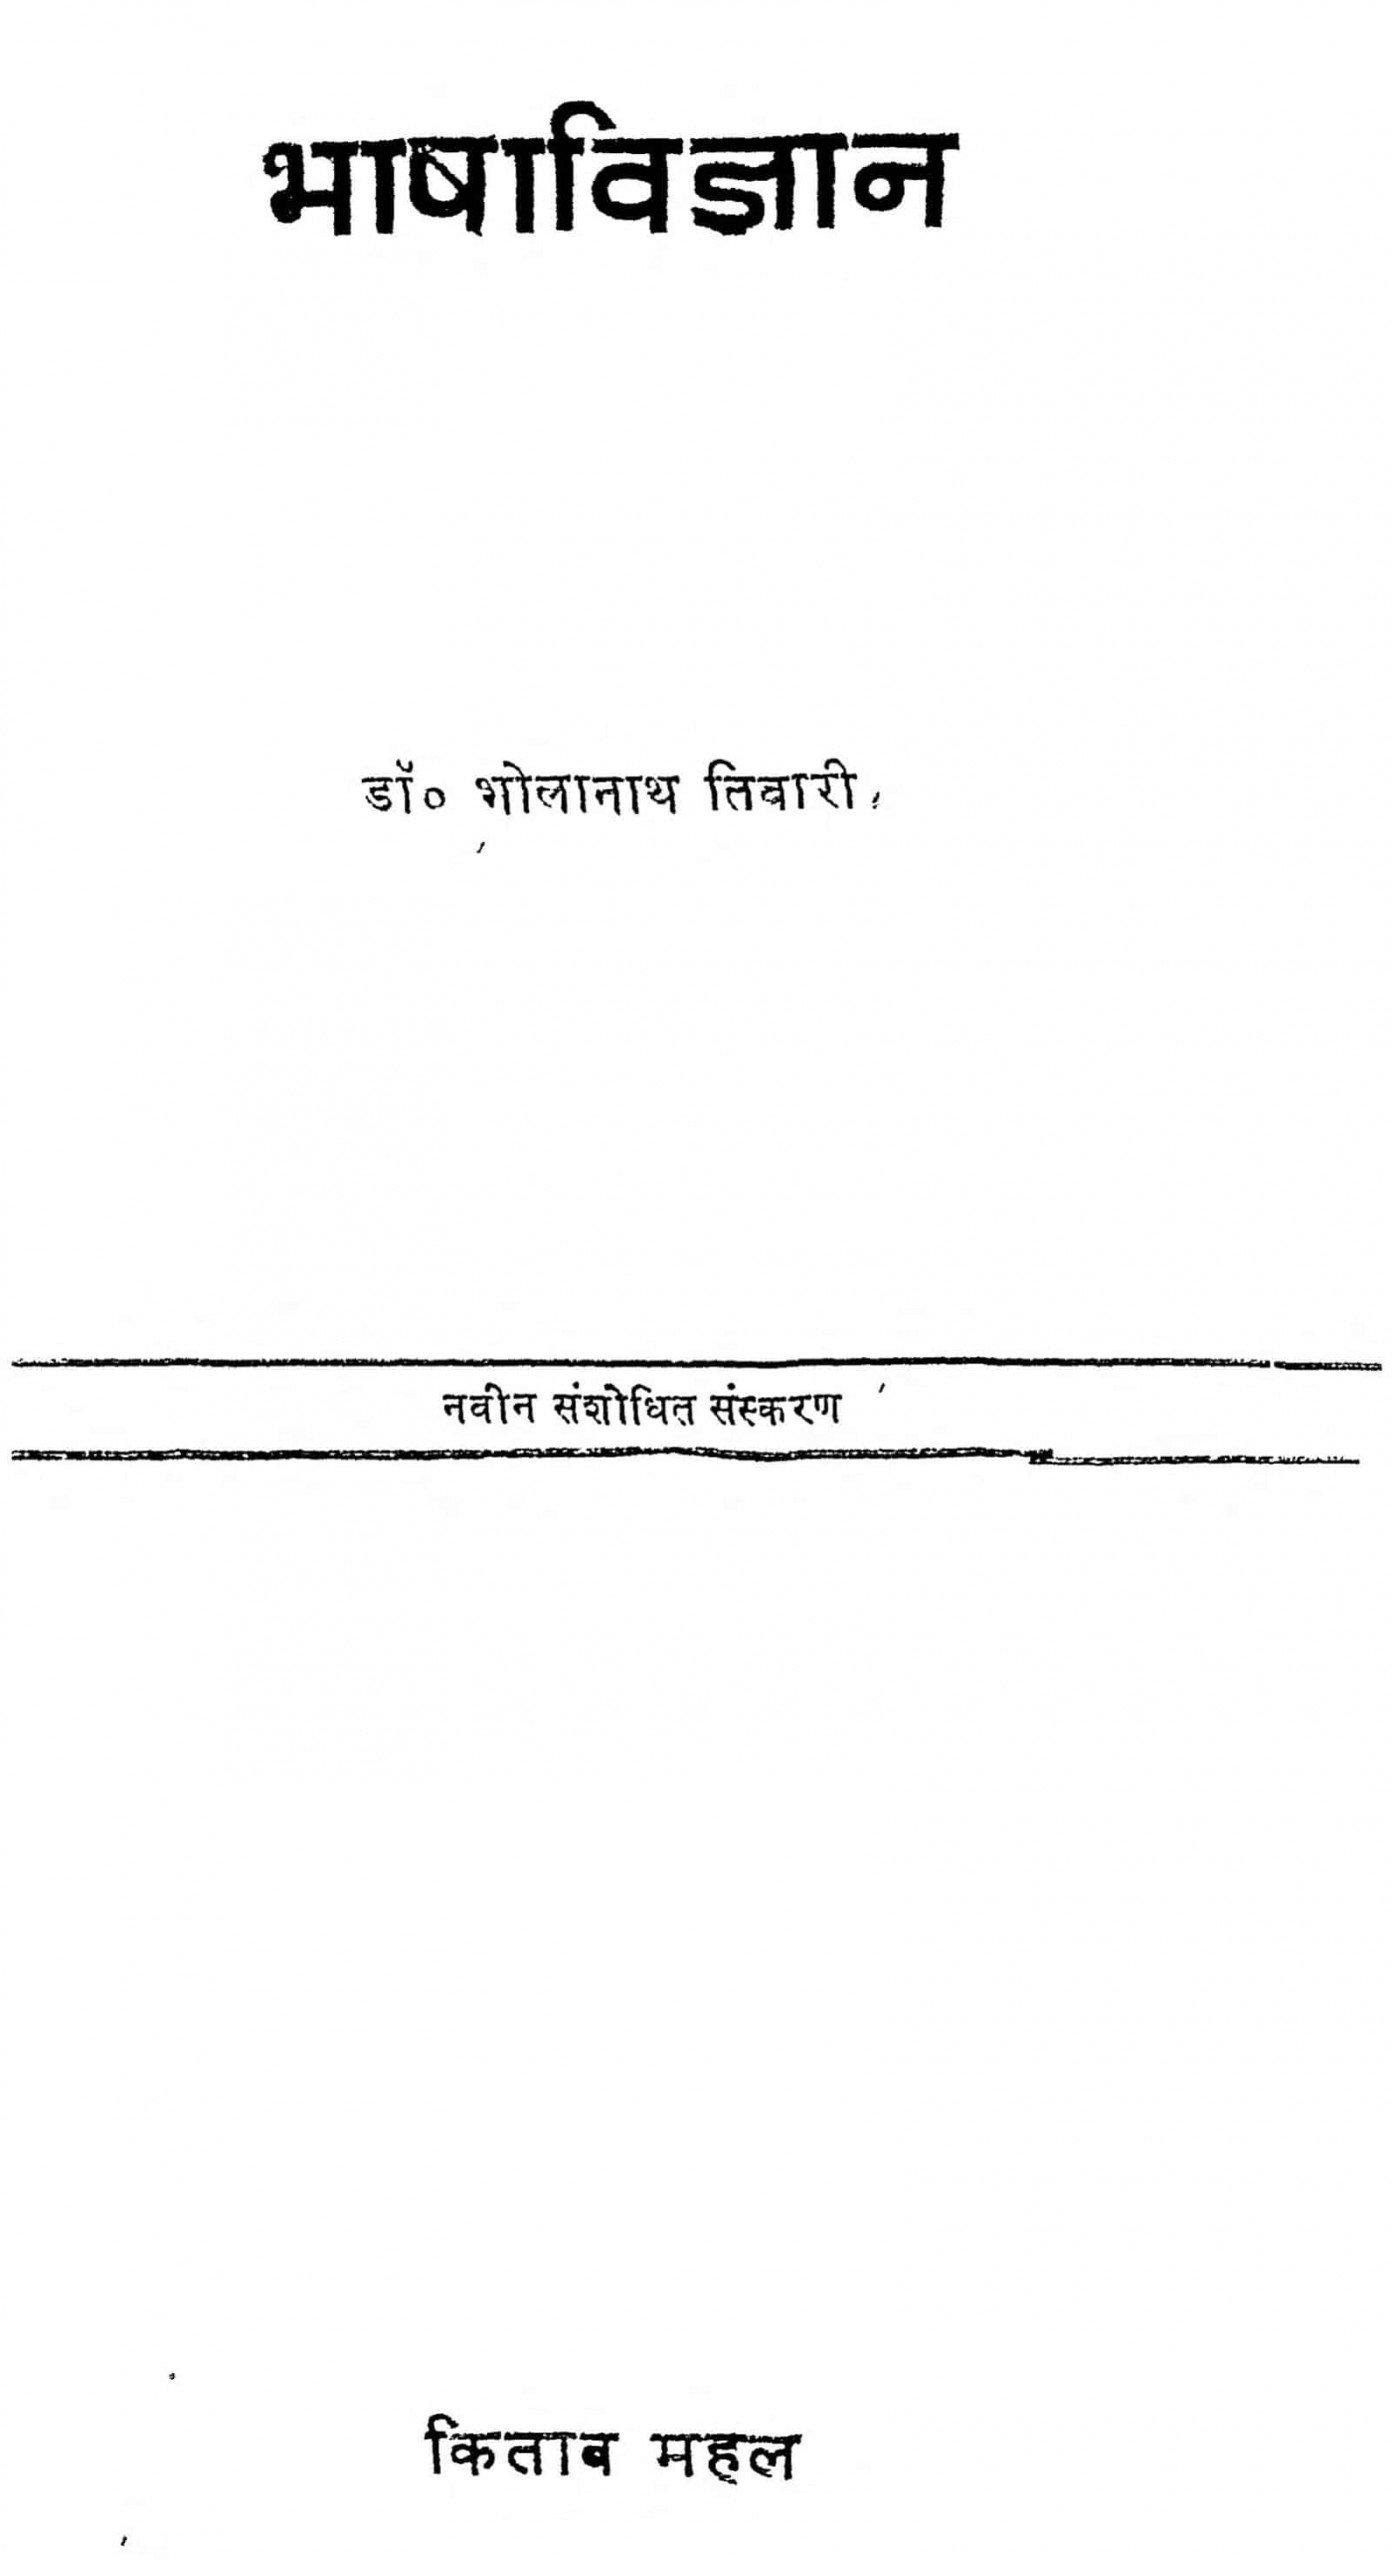 Book Image : भाषाविज्ञान - Bhashavigyan